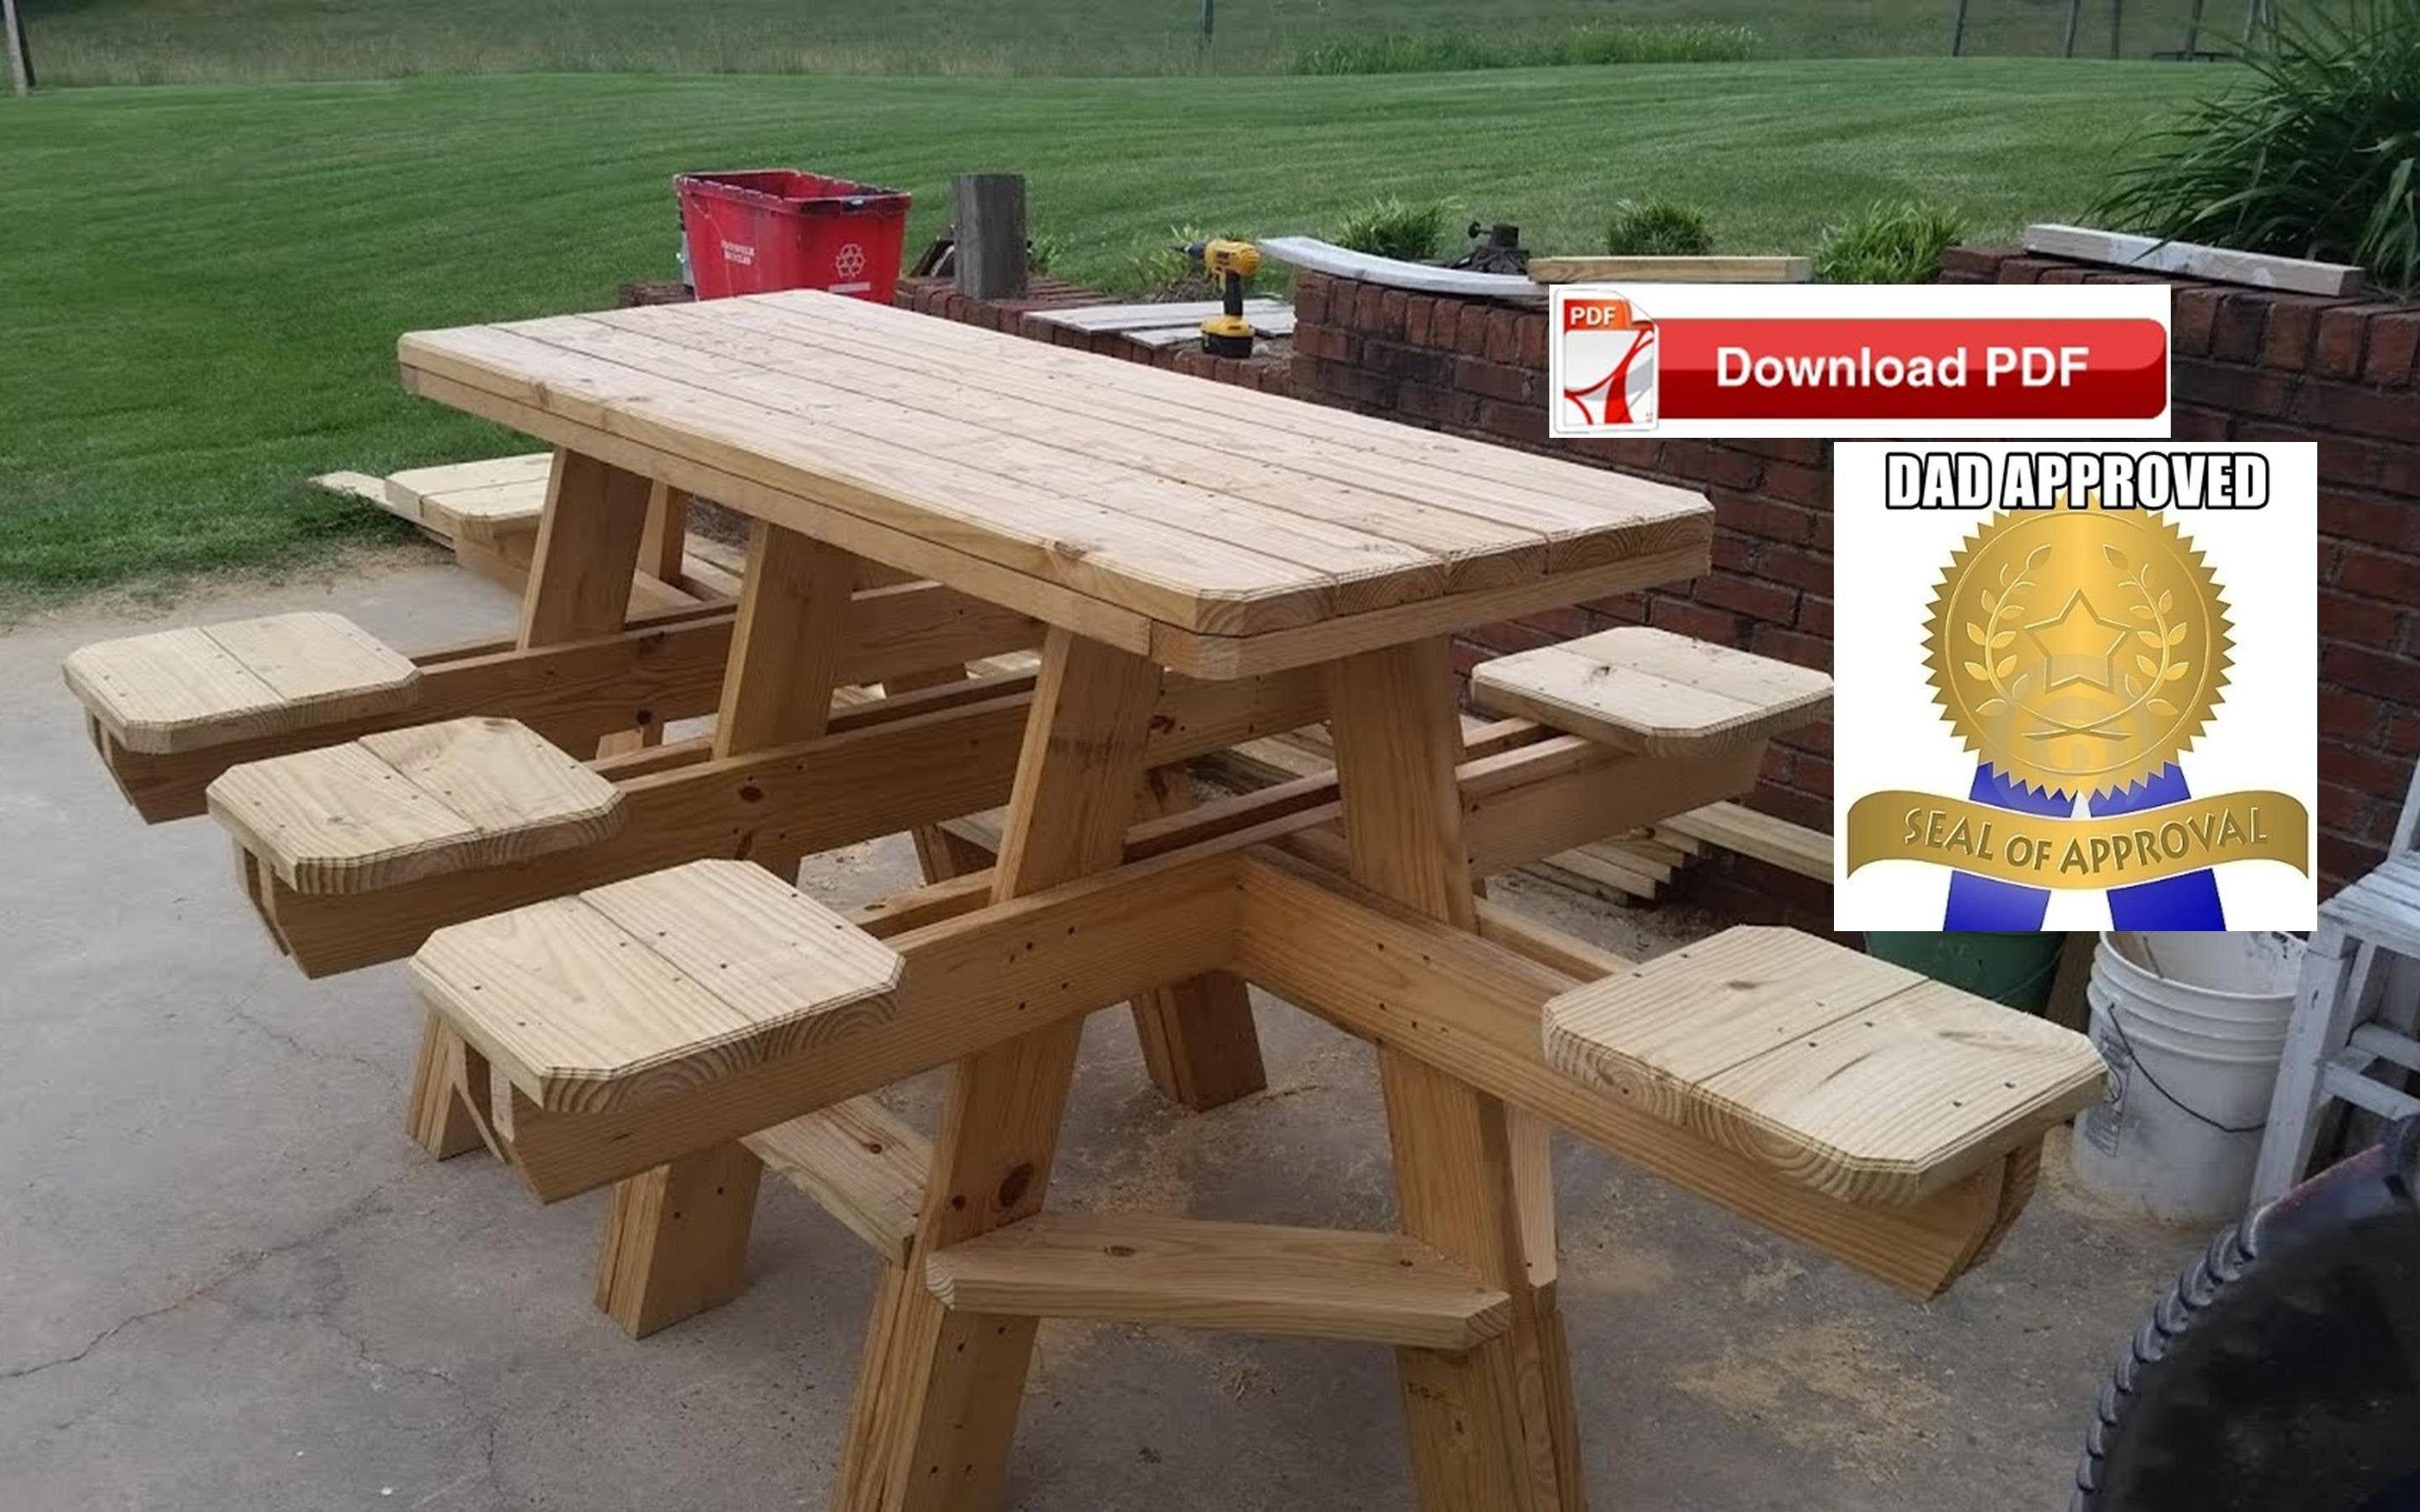 8 Seat Picnic Table Plan Bbq Table Plan Picnic Table Plan Wood Etsy Bbq Table Picnic Table Picnic Table Plans